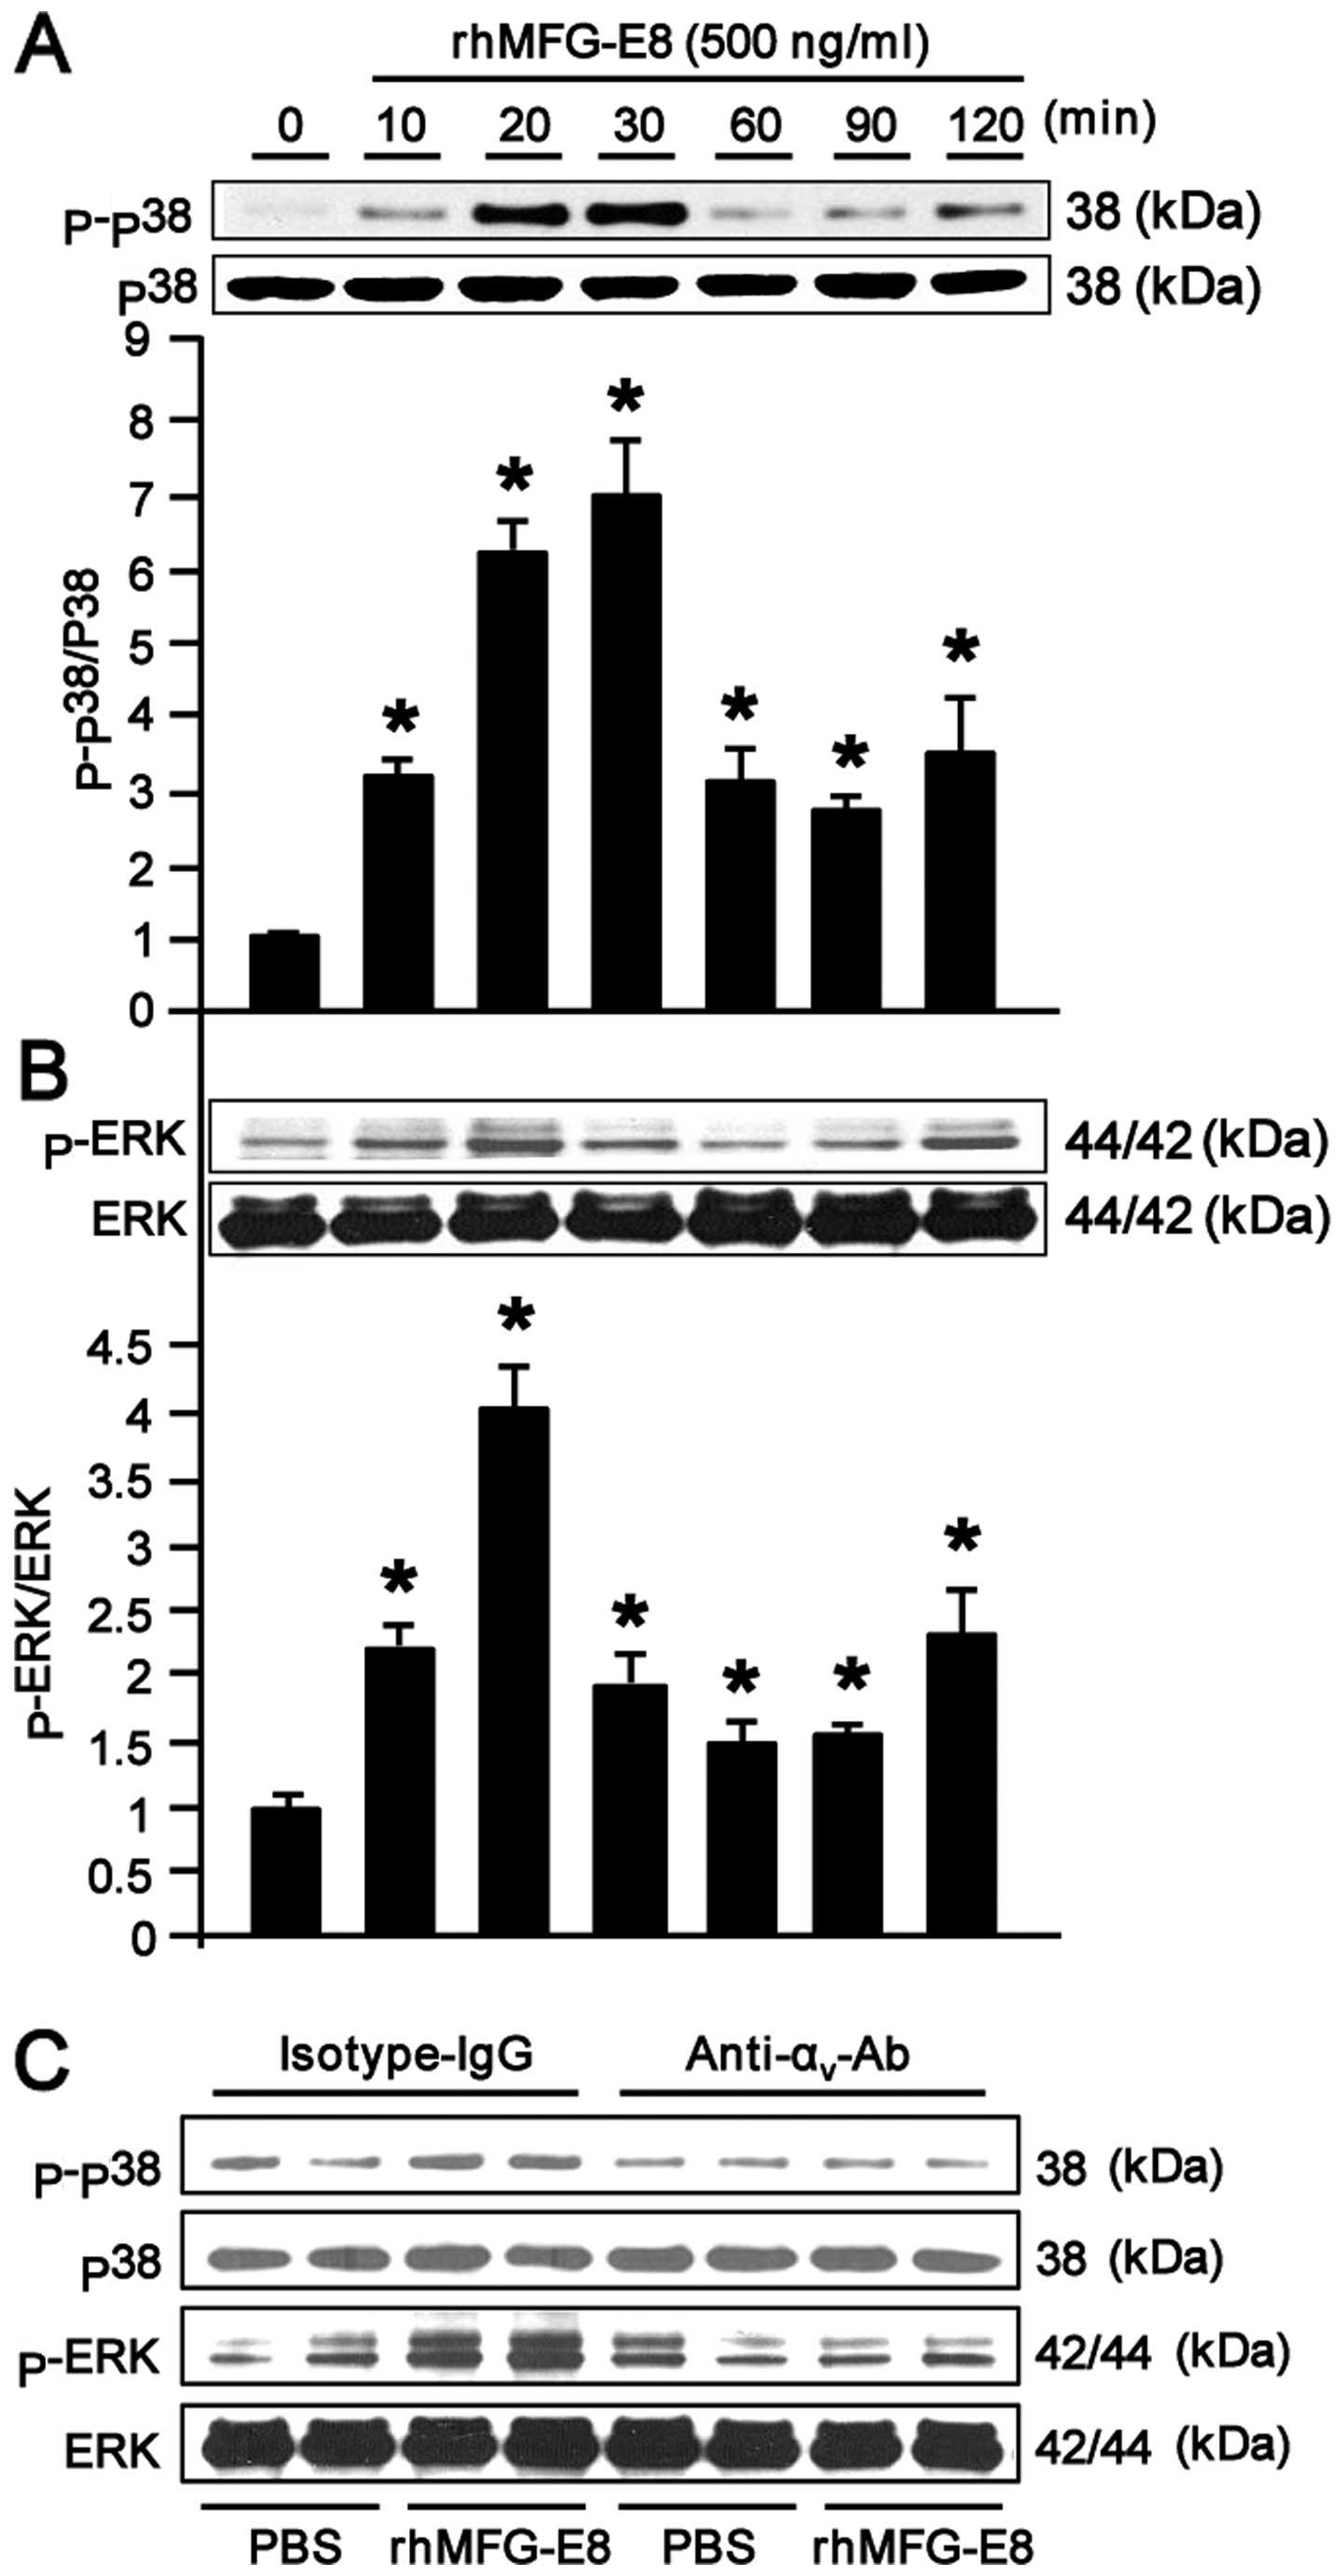 Mfg E8 Inhibits Neutrophil Migration Through V3 Integrin Dependent Block Diagram Fluid Inventor Ab Figure 3 Recombinant Human Milk Fat Globule Epidermal Growth Factor 8 Rhmfg Activates Mitogen Activated Protein Map Kinases